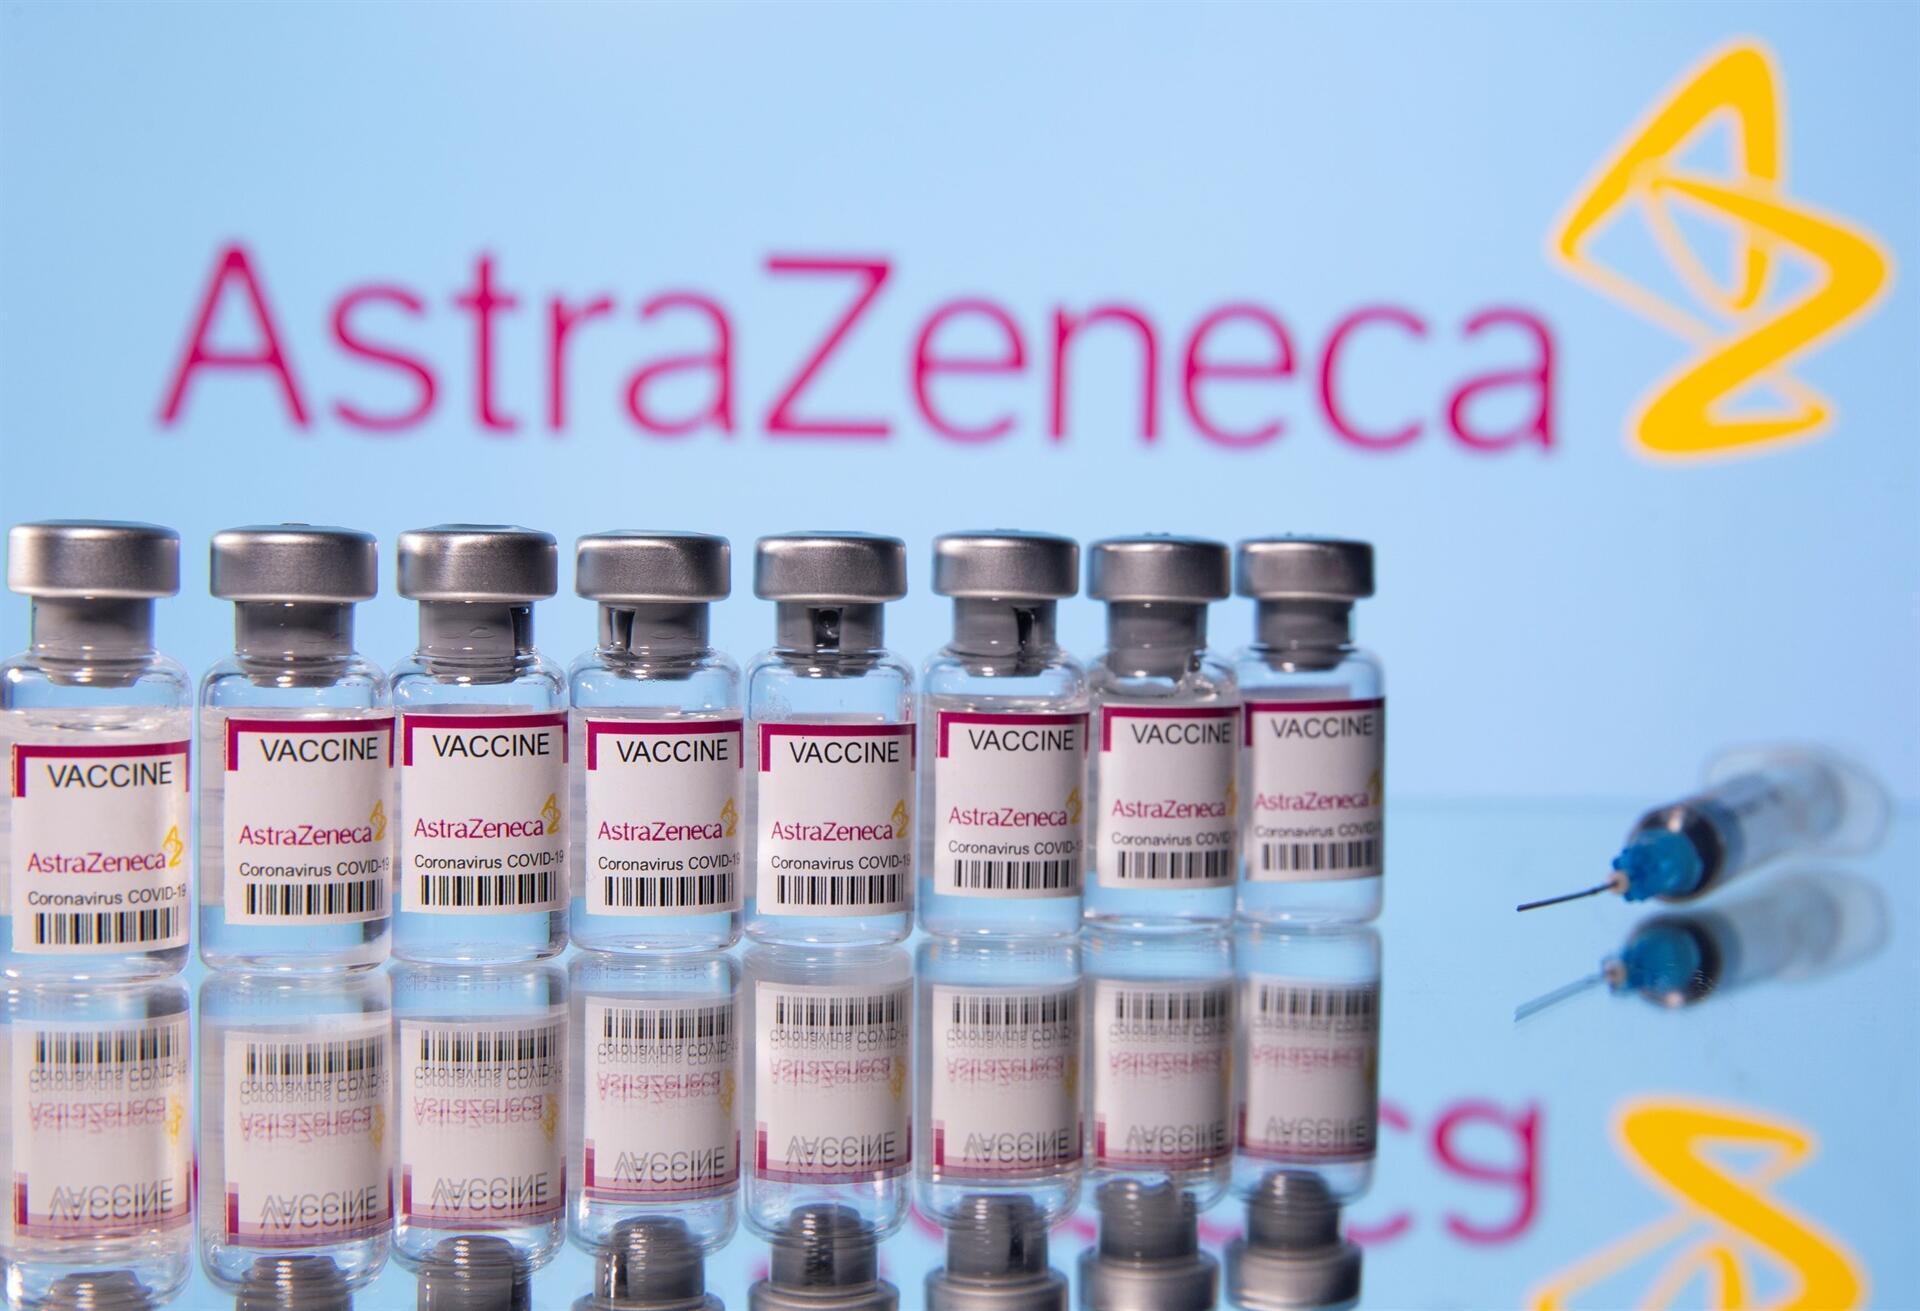 Italy under virus curbs again as Dutch, Irish stop AstraZeneca shots